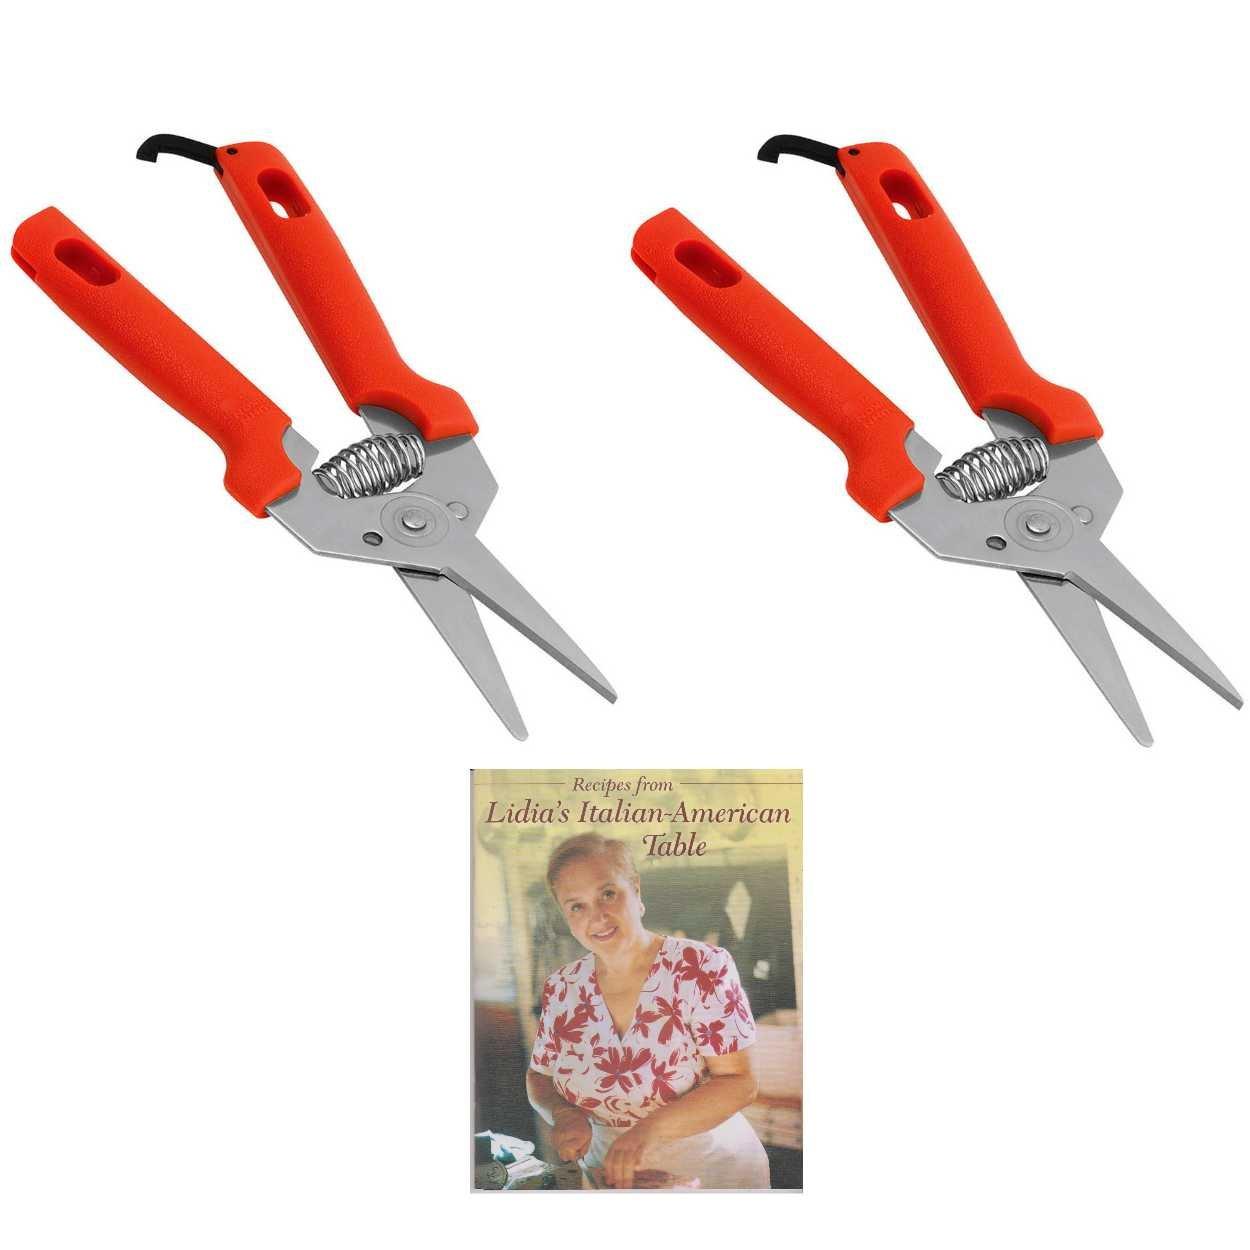 Set of Two Kuhn Rikon 27007-KUHN Classic Mini Snips (Red) Includes Cookbook